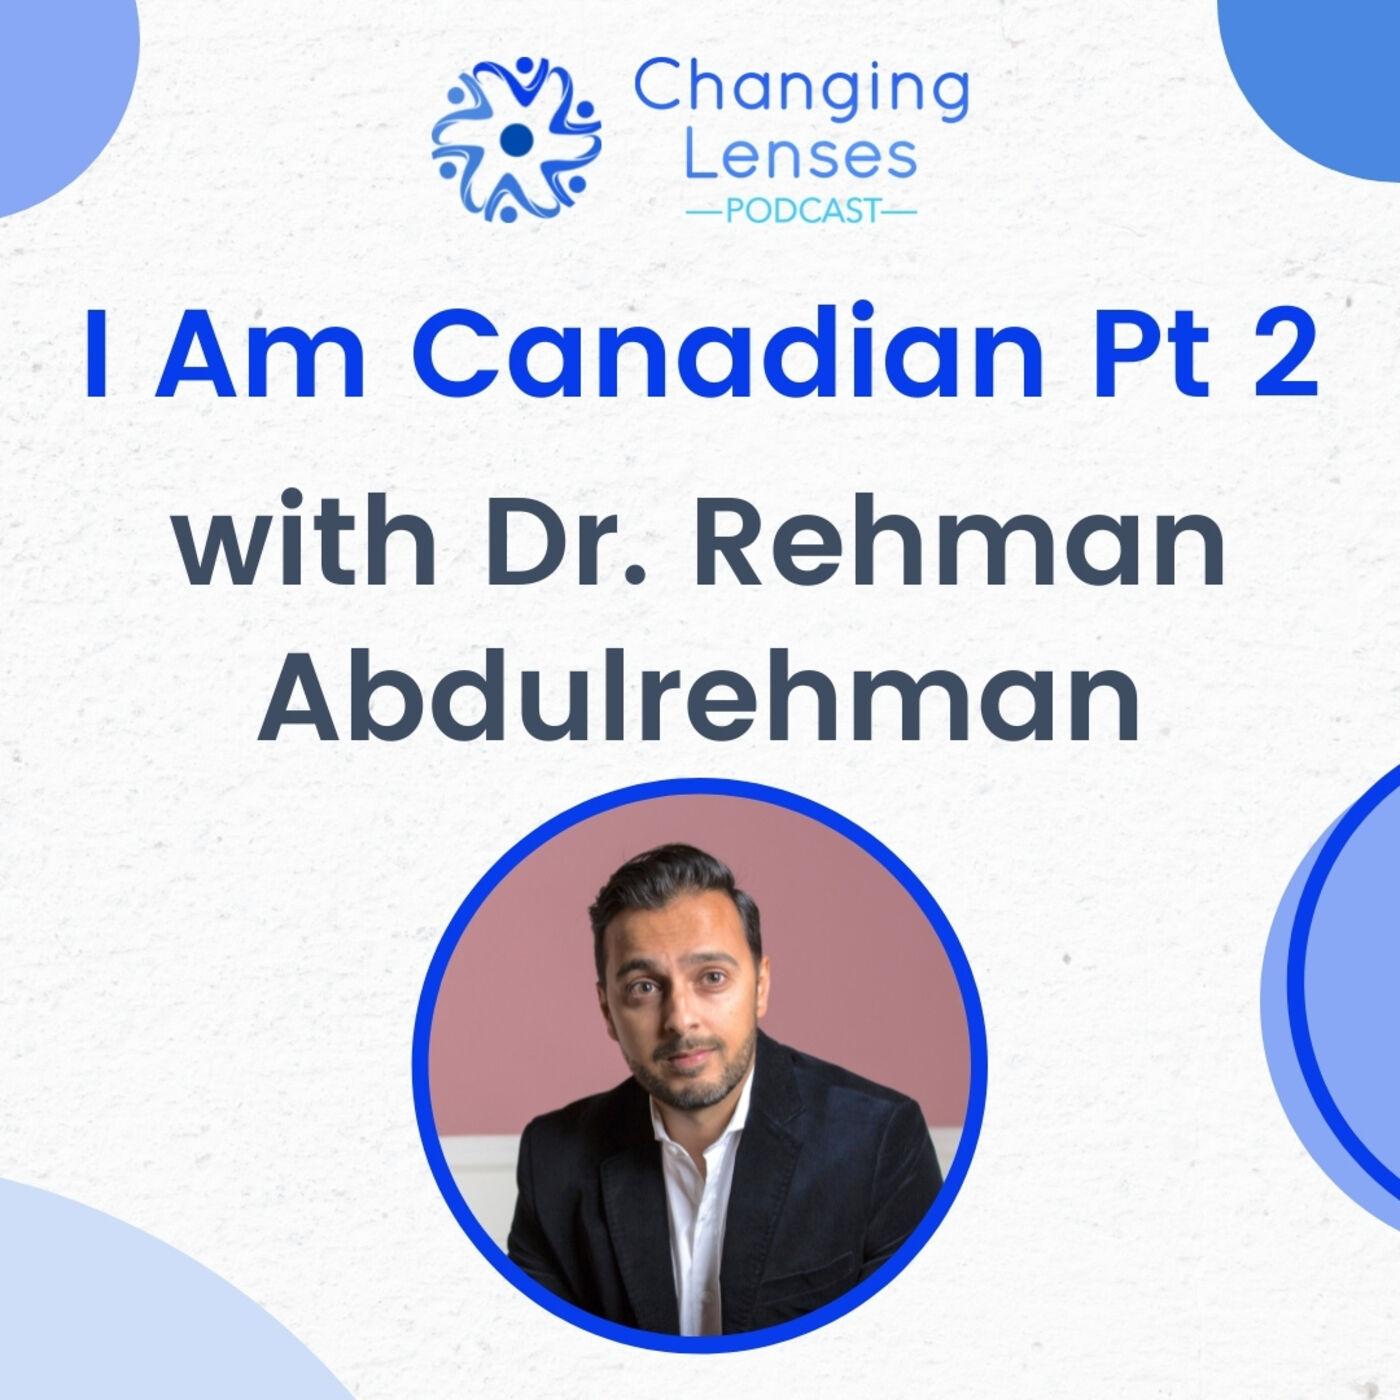 Ep03: I Am Canadian Part 2, with Dr. Rehman Abdulrehman